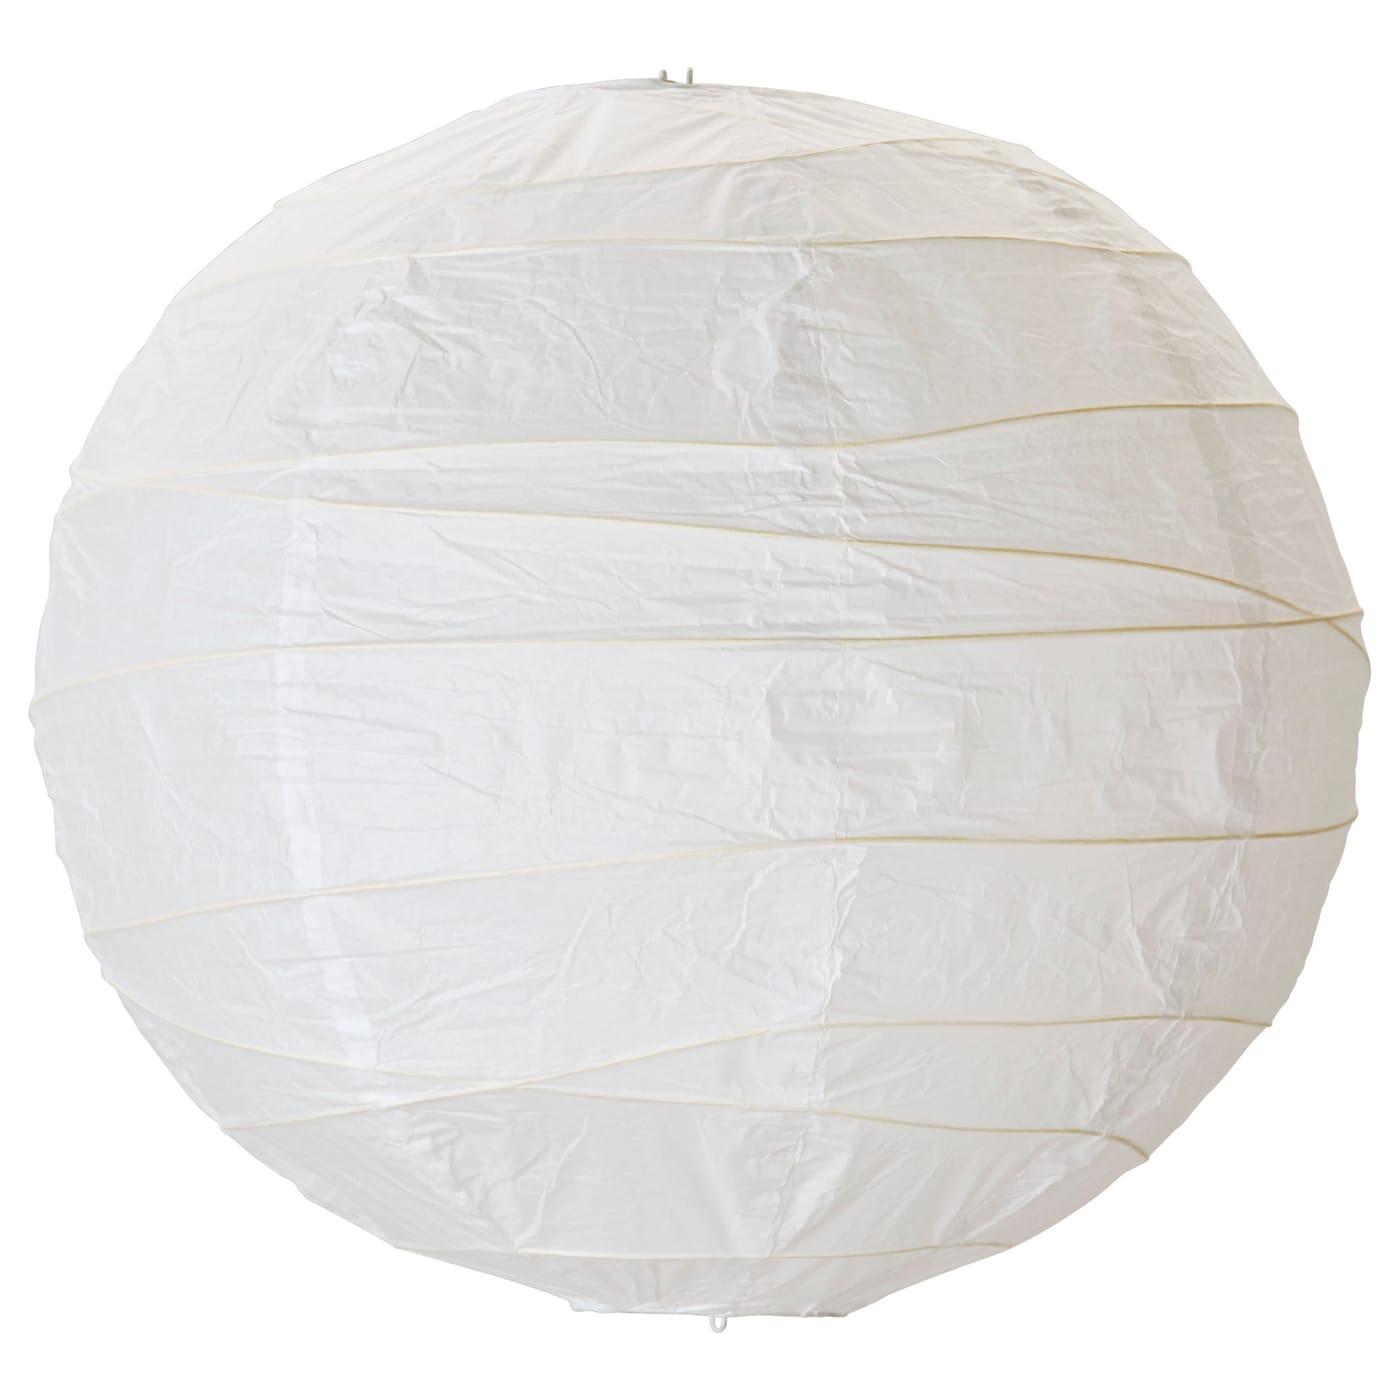 Ikea Elschirm ekås leuchtenschirm 34 cm ikea